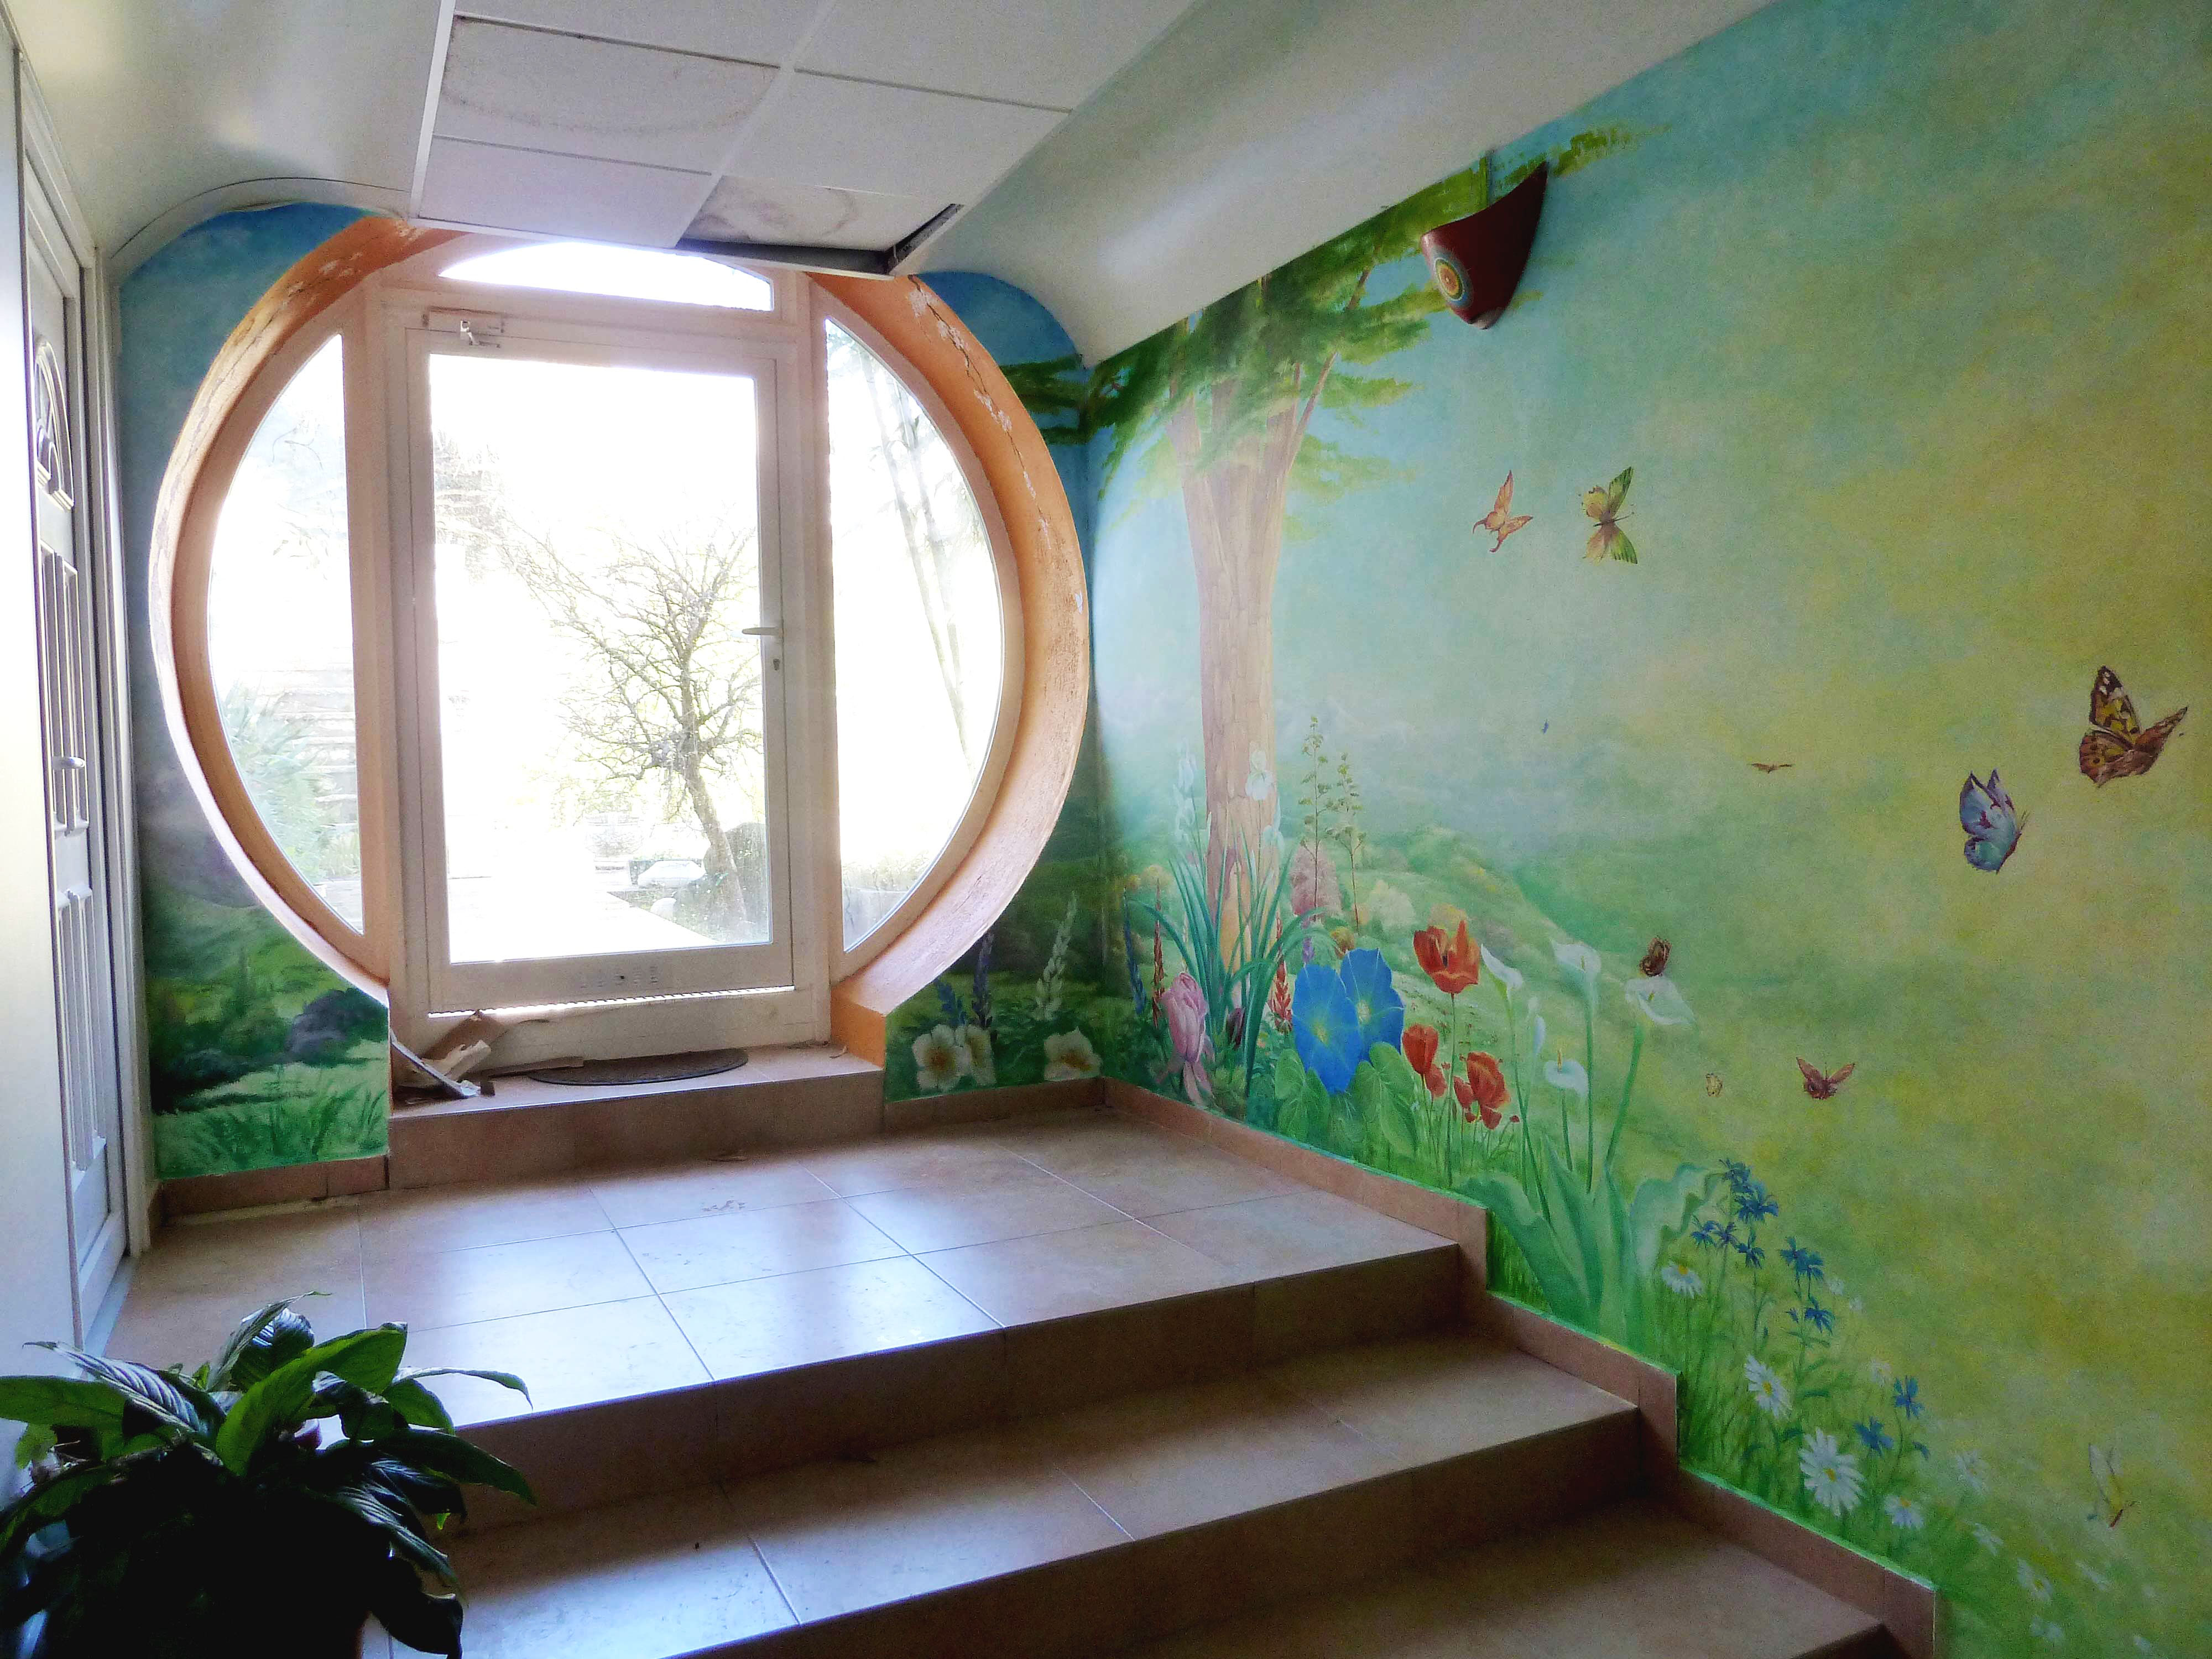 TX Art Mural en M/étal Grande Maison Arts D/écoratifs Europ/éens Modernes en Fer Salon Fond D/écoration Fleurs